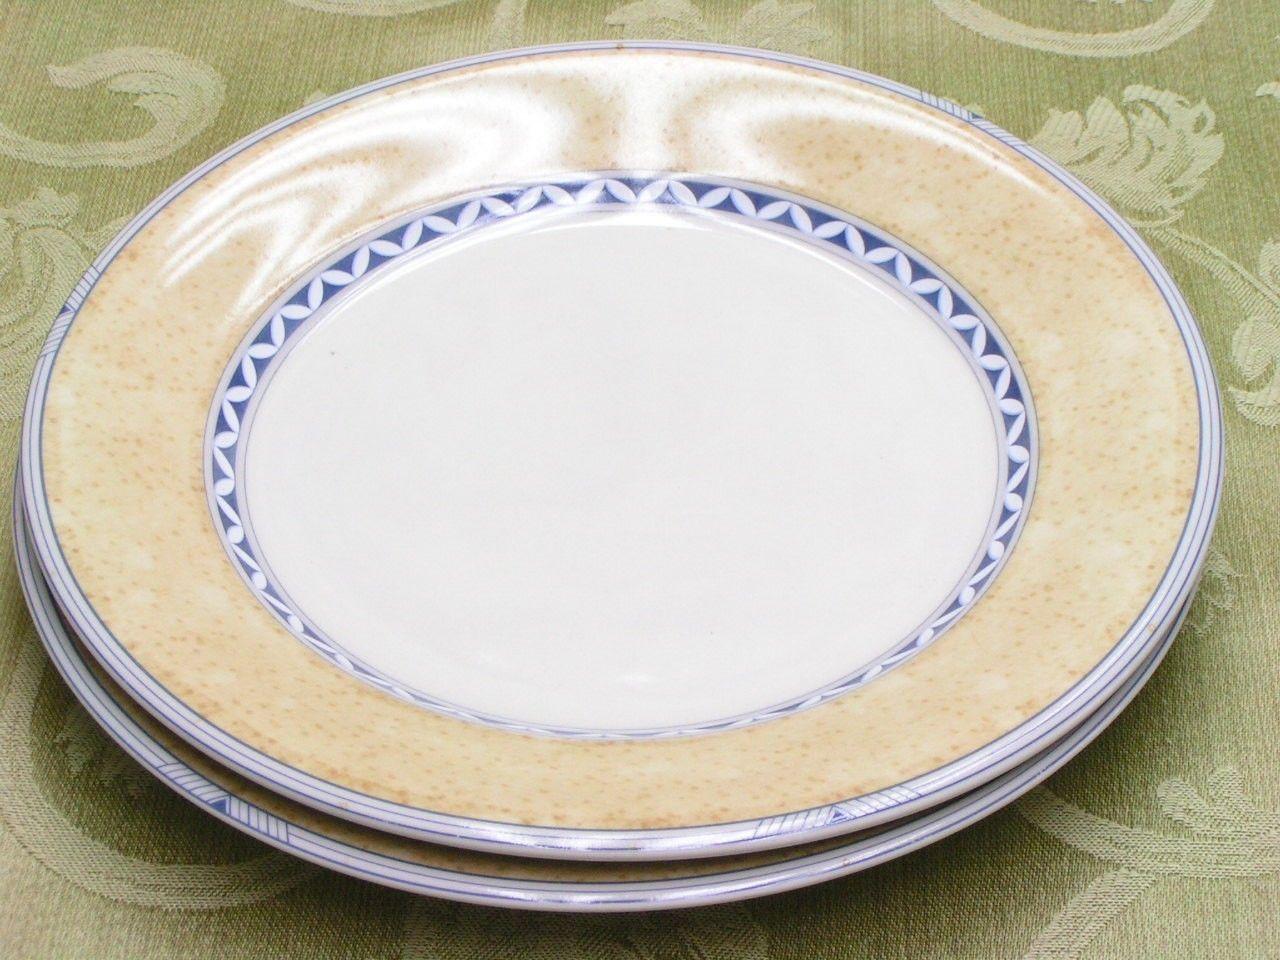 Sussex by Studio Nova Y2409 LOT 2 SALAD DESSERT PLATES - $37.39 & Studio Nova Plates: 20 listings